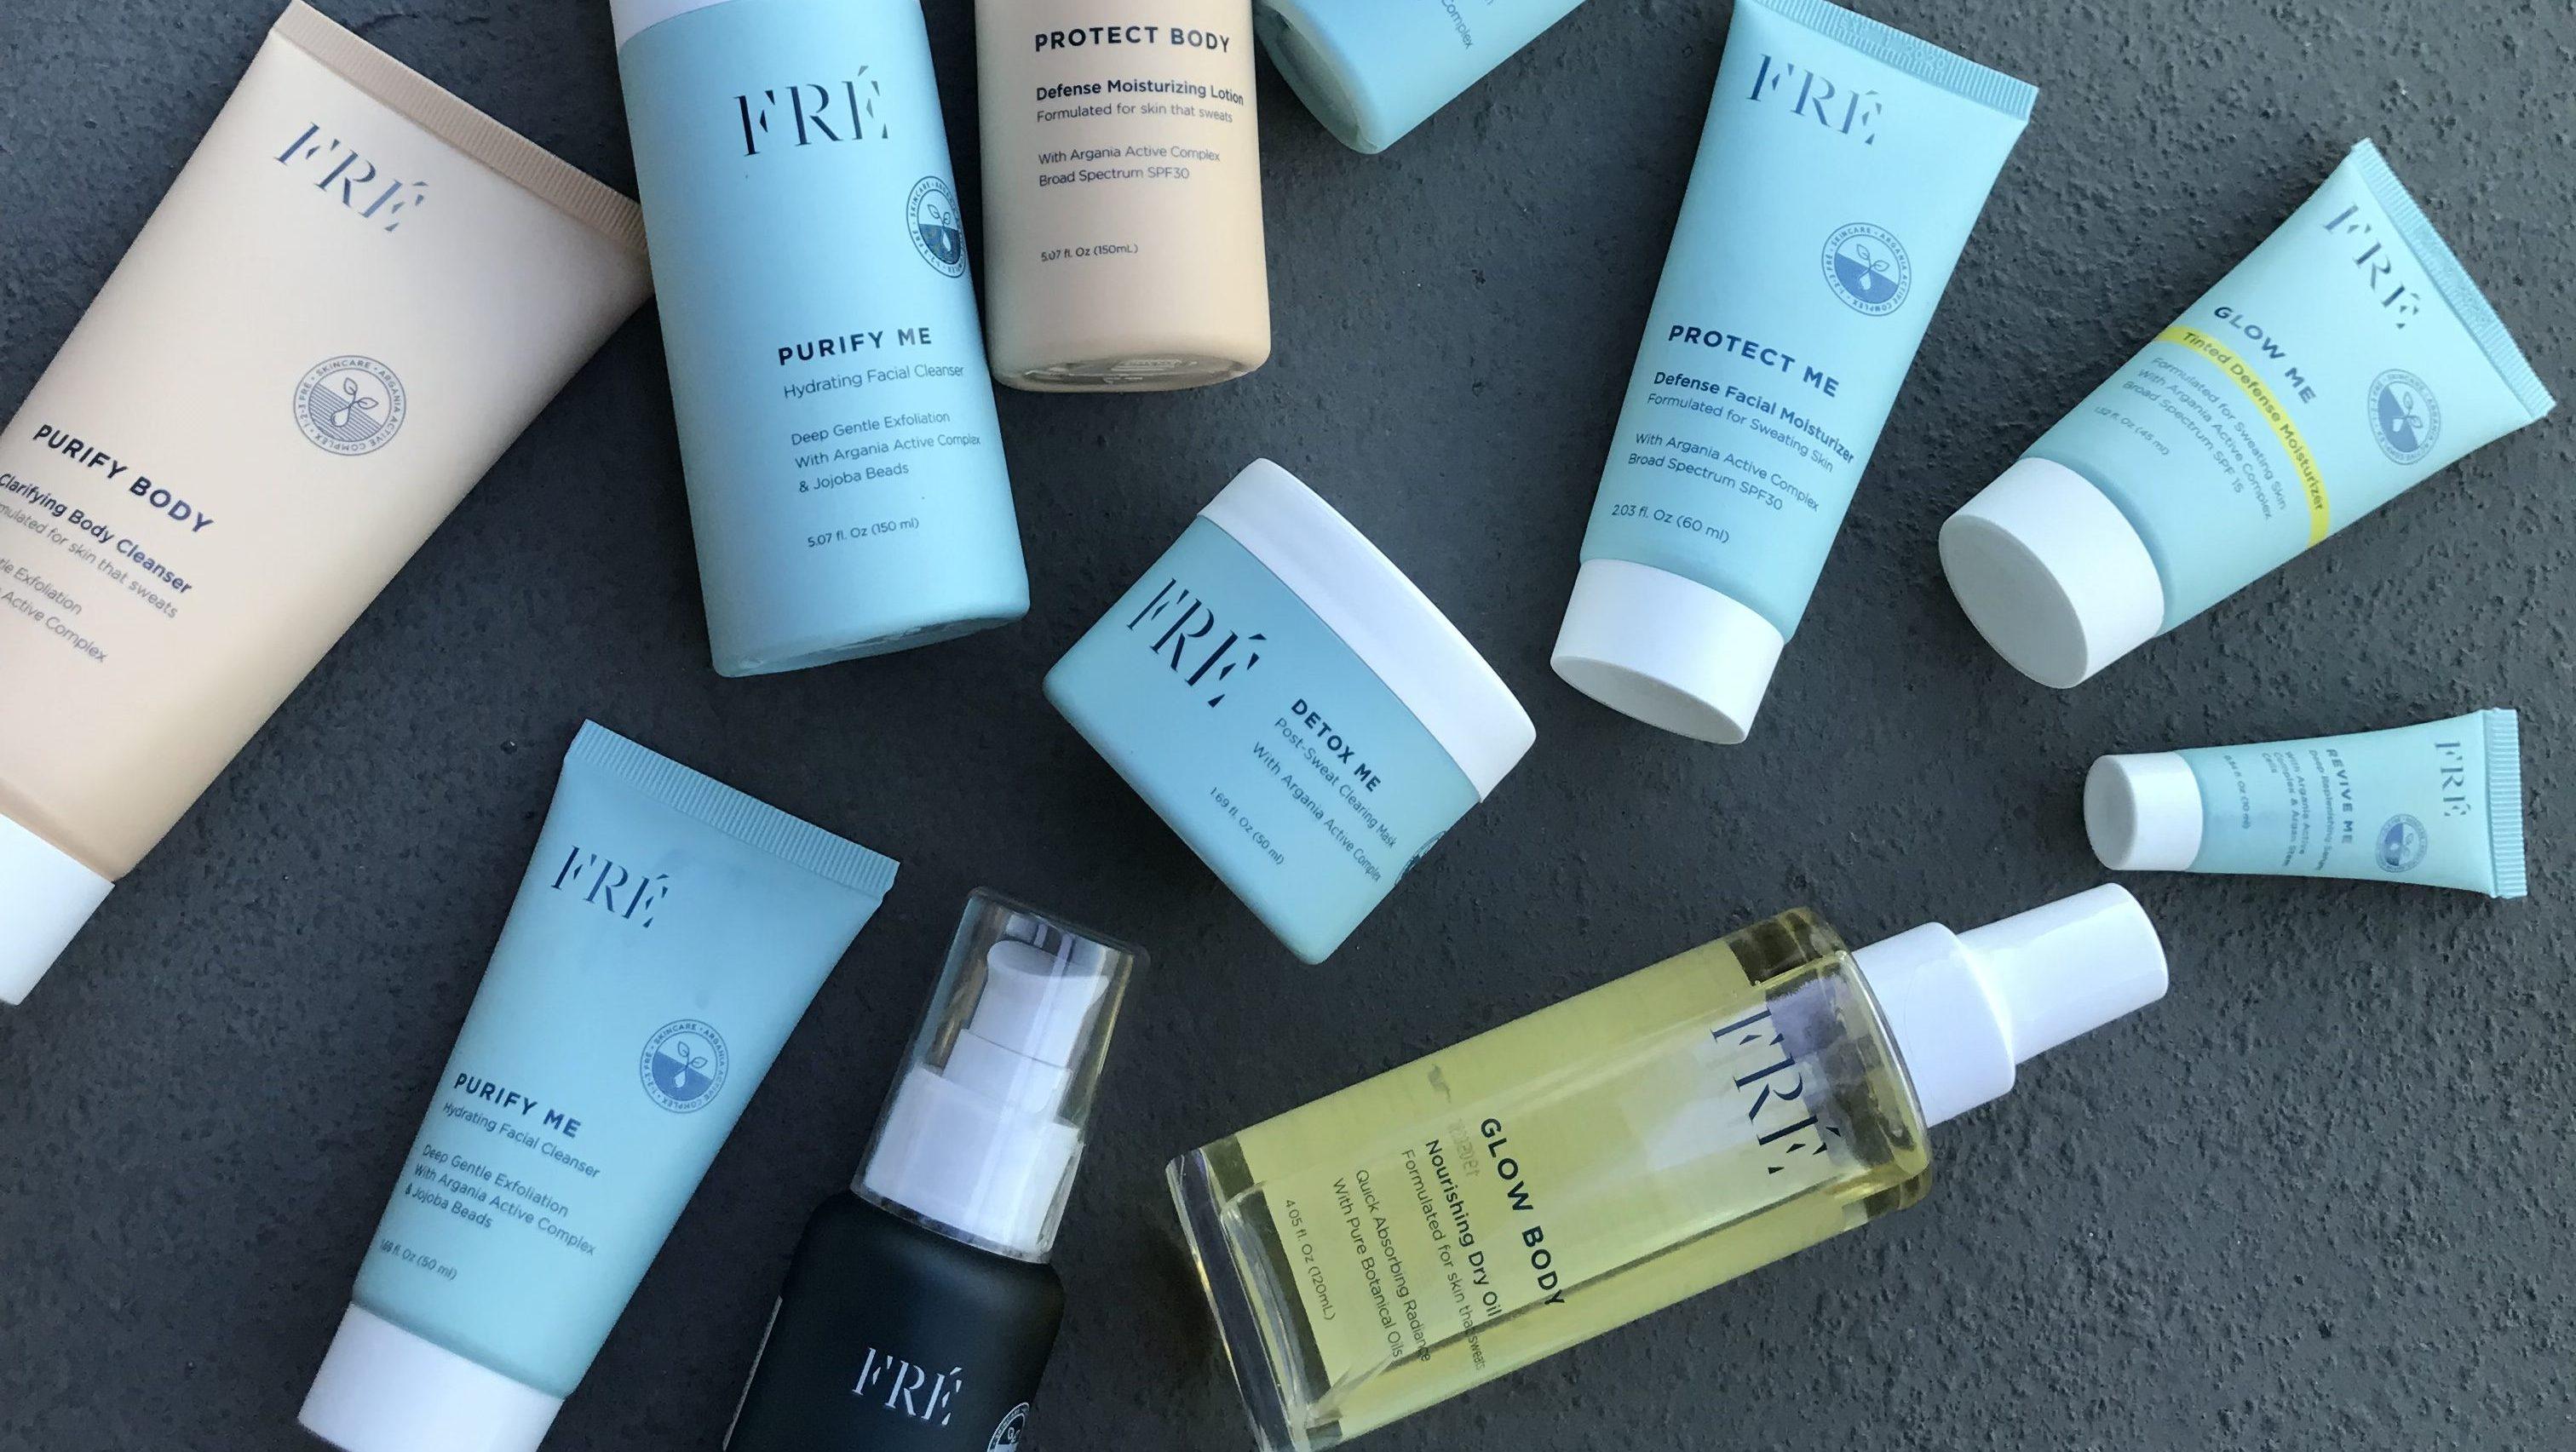 fre skin care